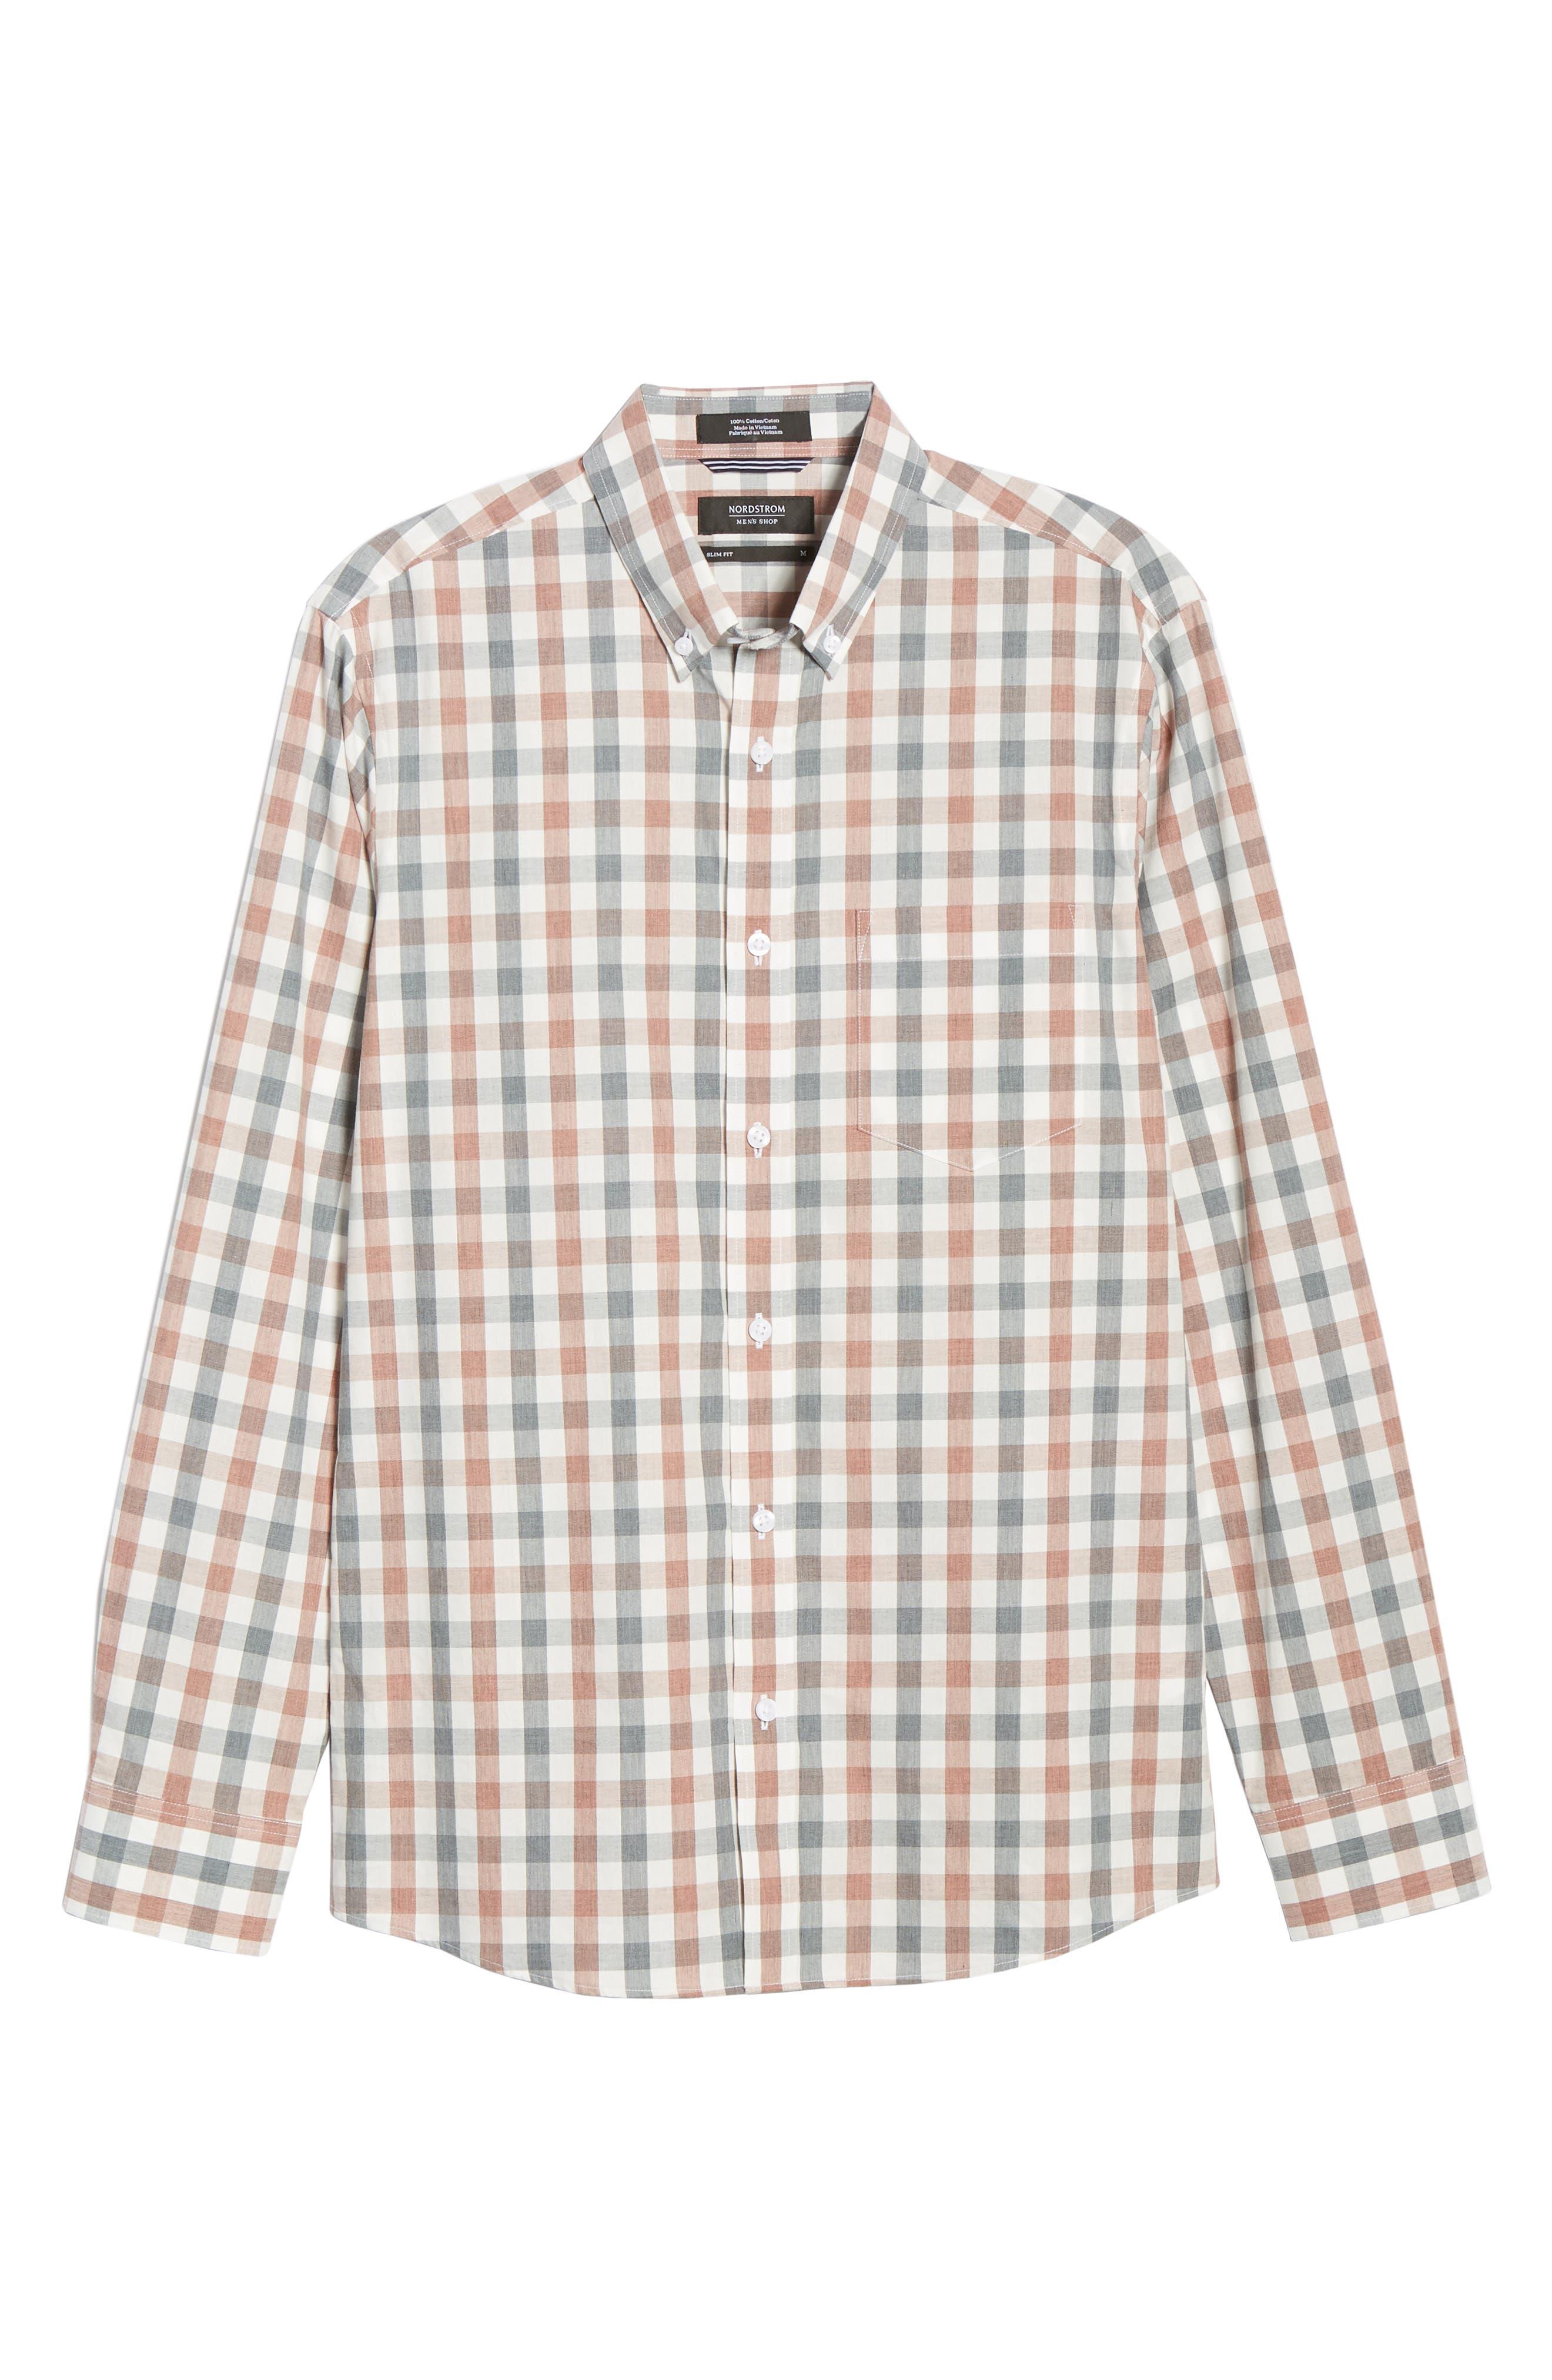 Check Sport Shirt,                             Alternate thumbnail 5, color,                             GREY RED WHITE MELANGE CHECK